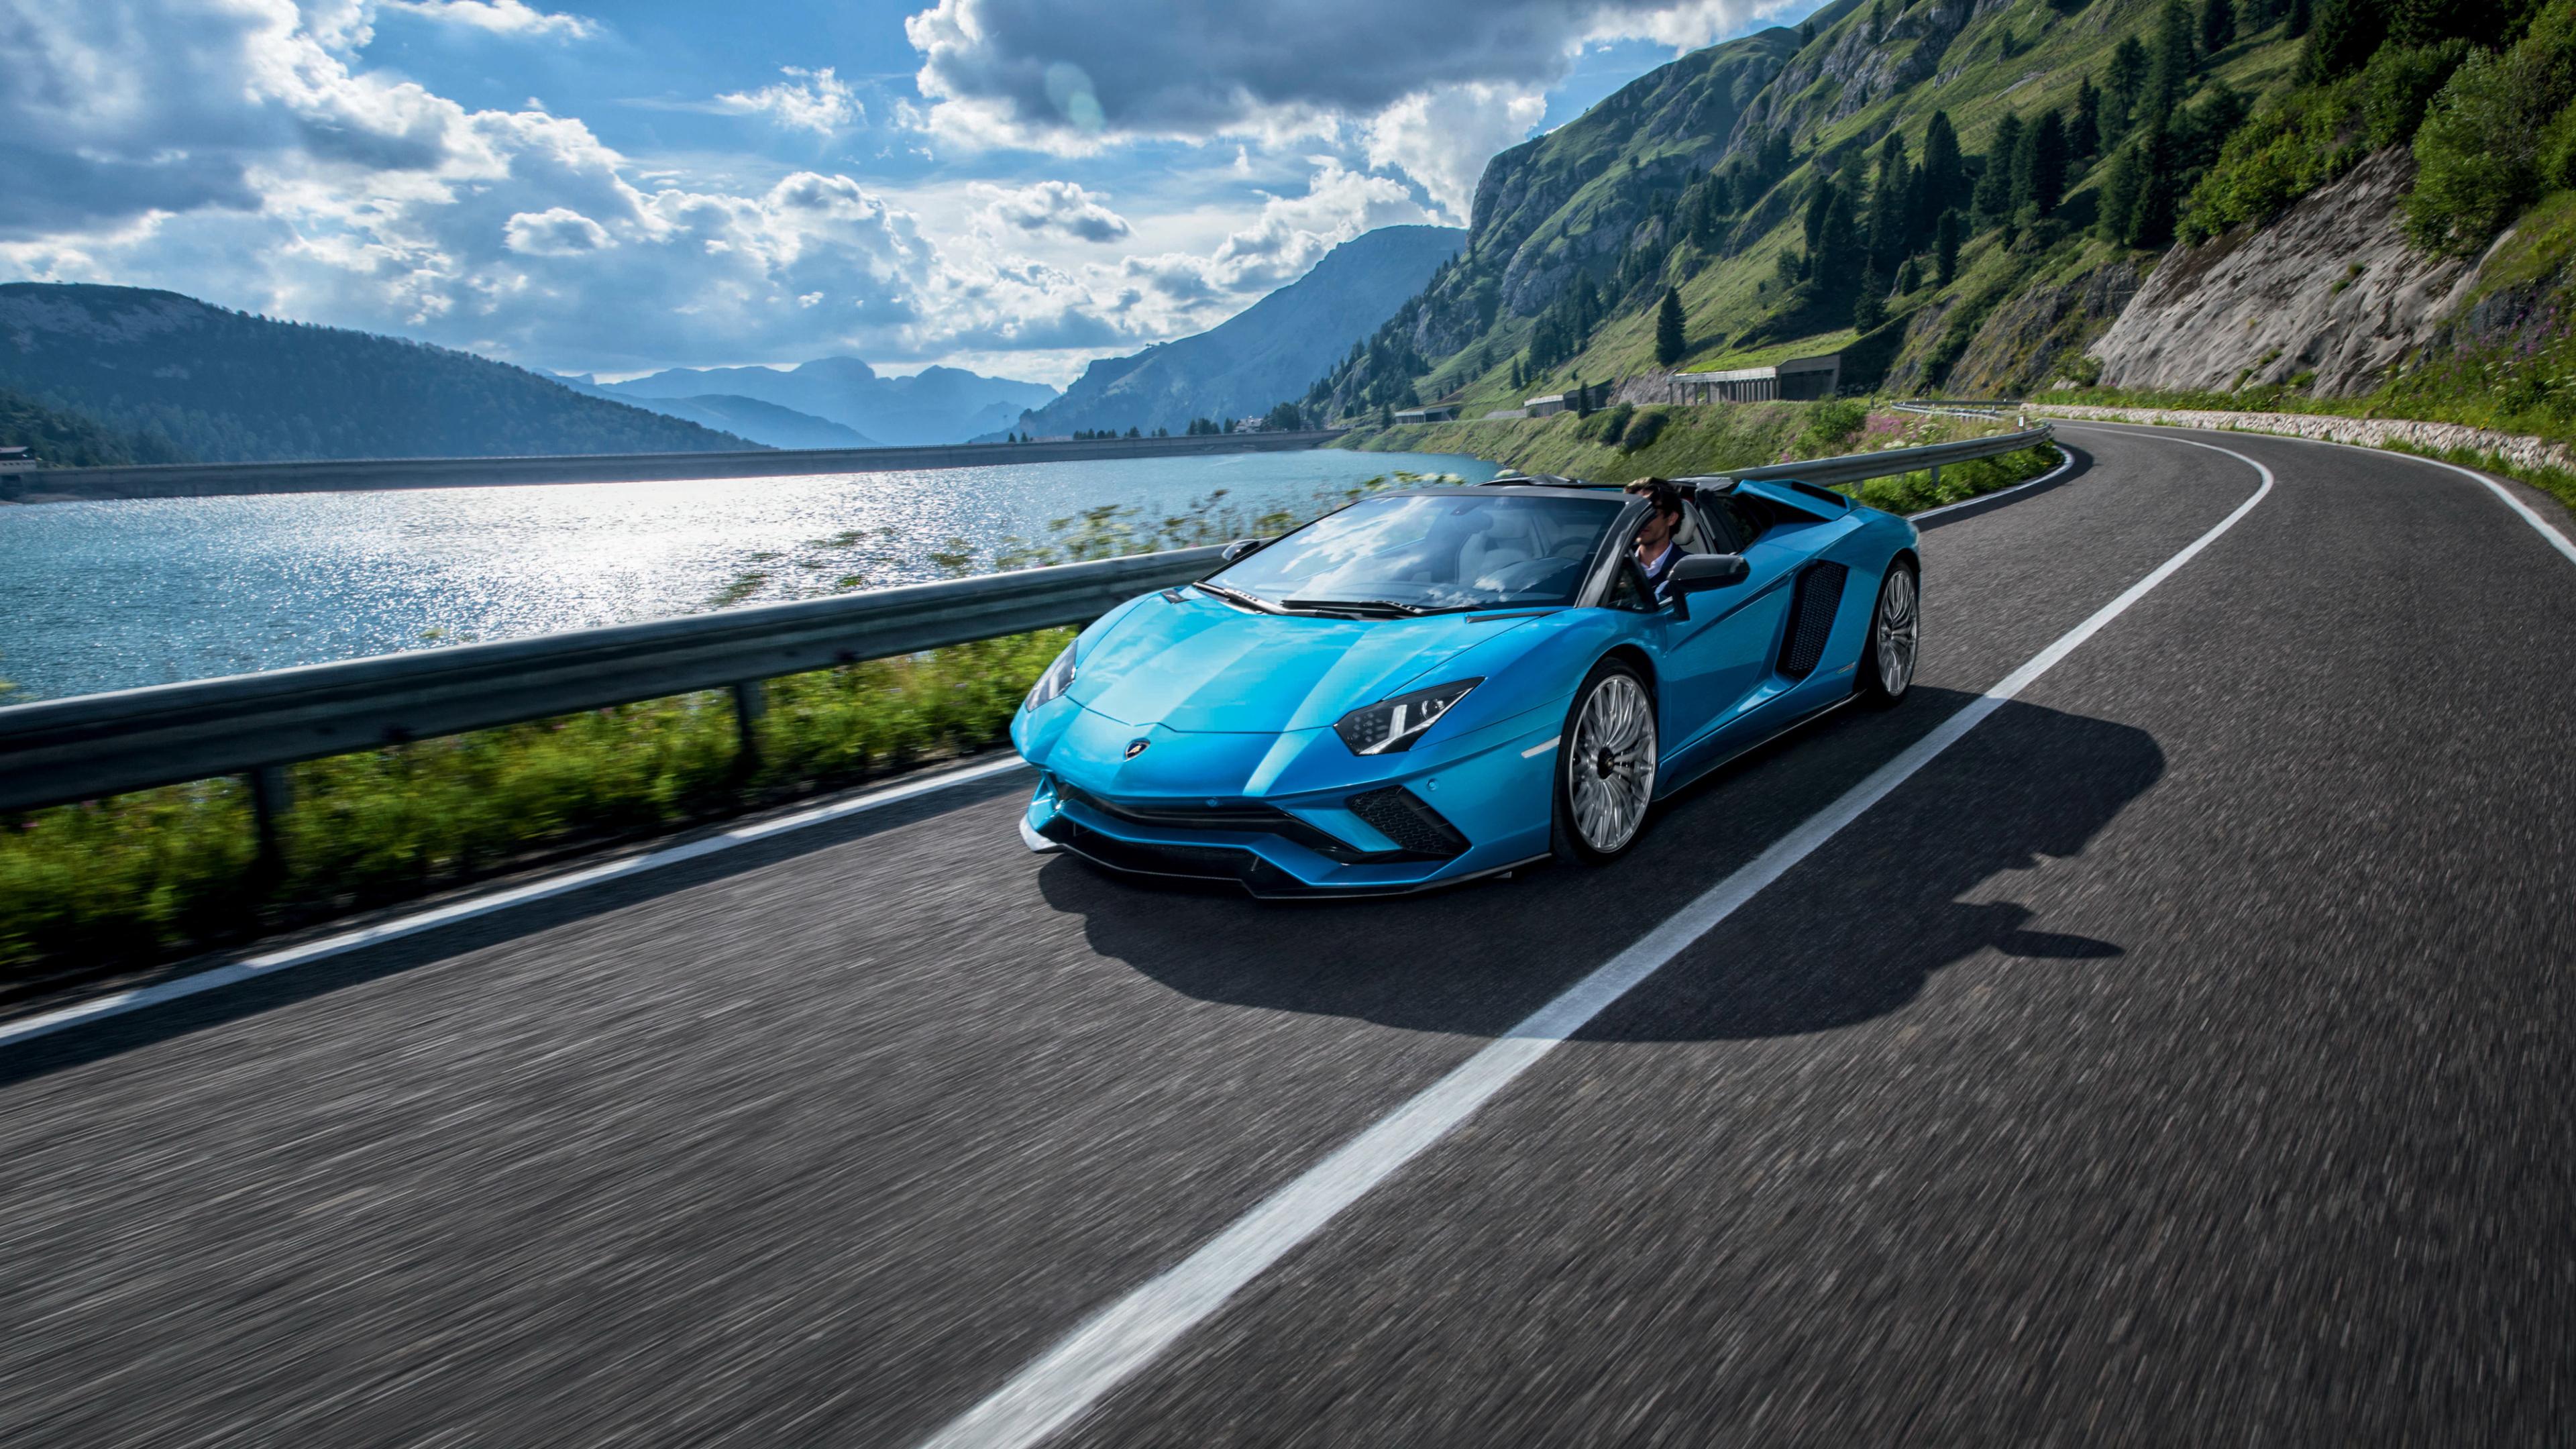 3840x2160 Lamborghini Aventador S Roadster 4K Wallpaper ...